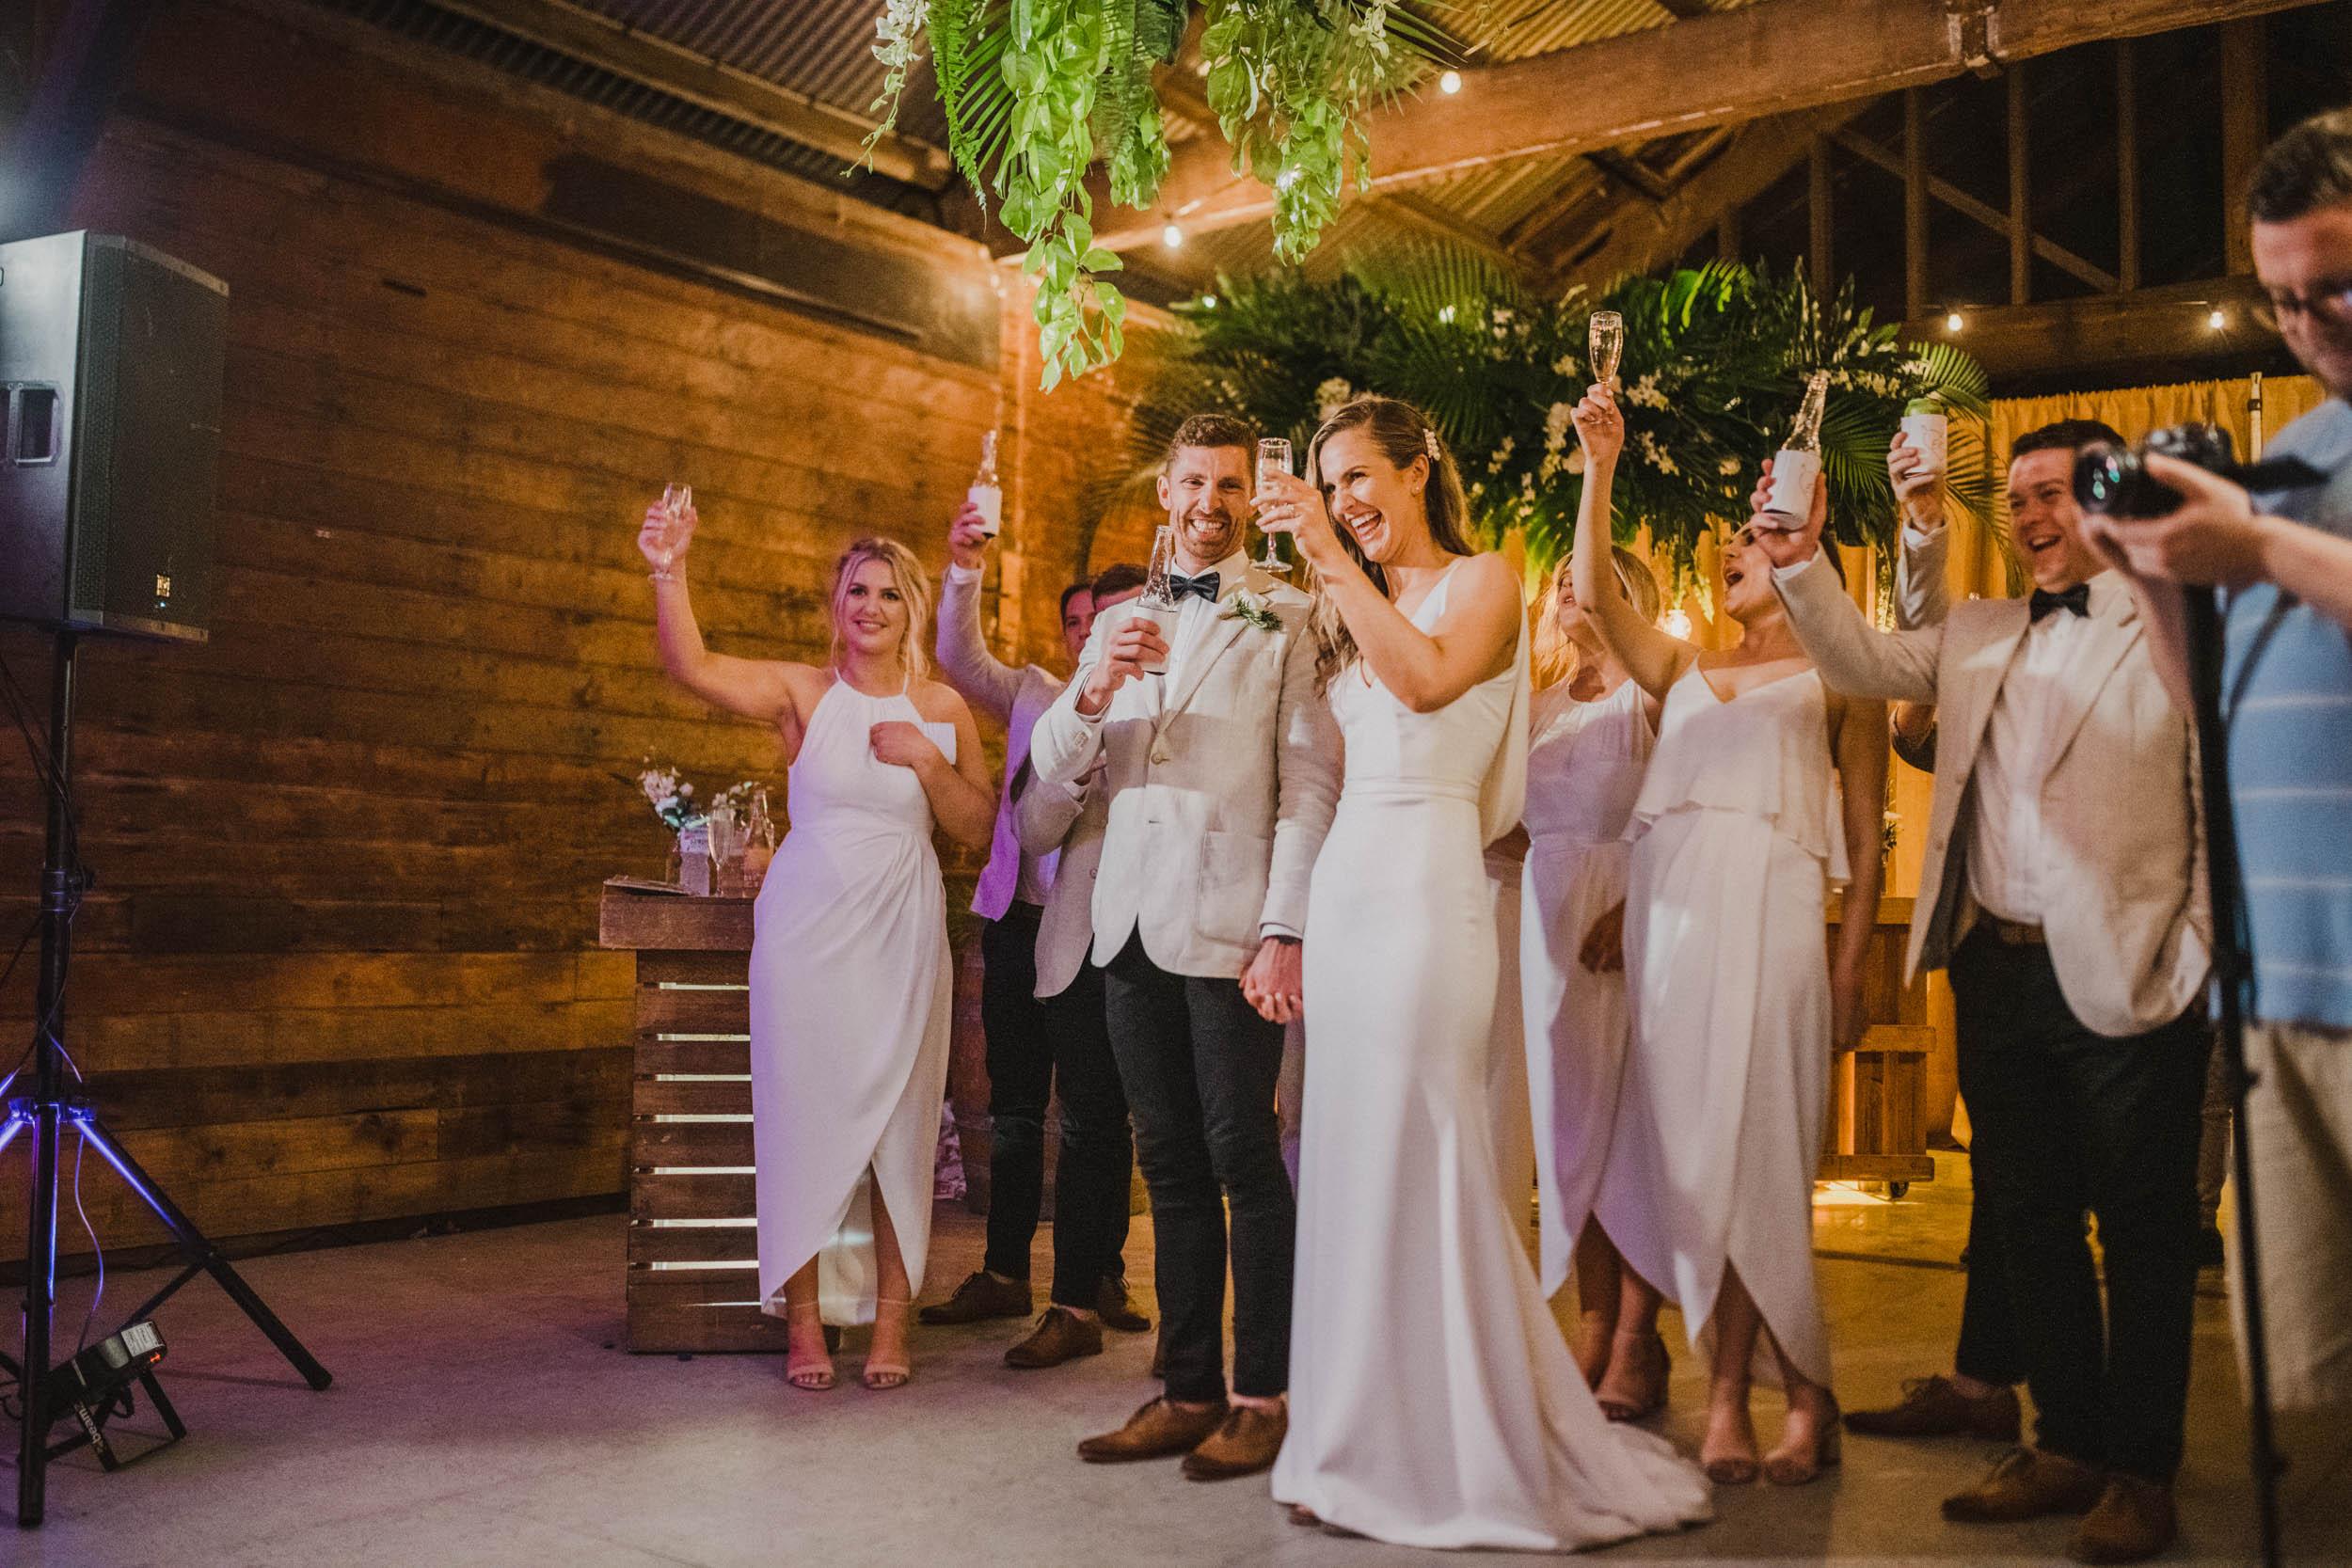 The Raw Photographer - Cairns Wedding Photographer - Port Douglas - Sugar Wharf - Vasaliki Couture Dress - Destination Venue-77.jpg